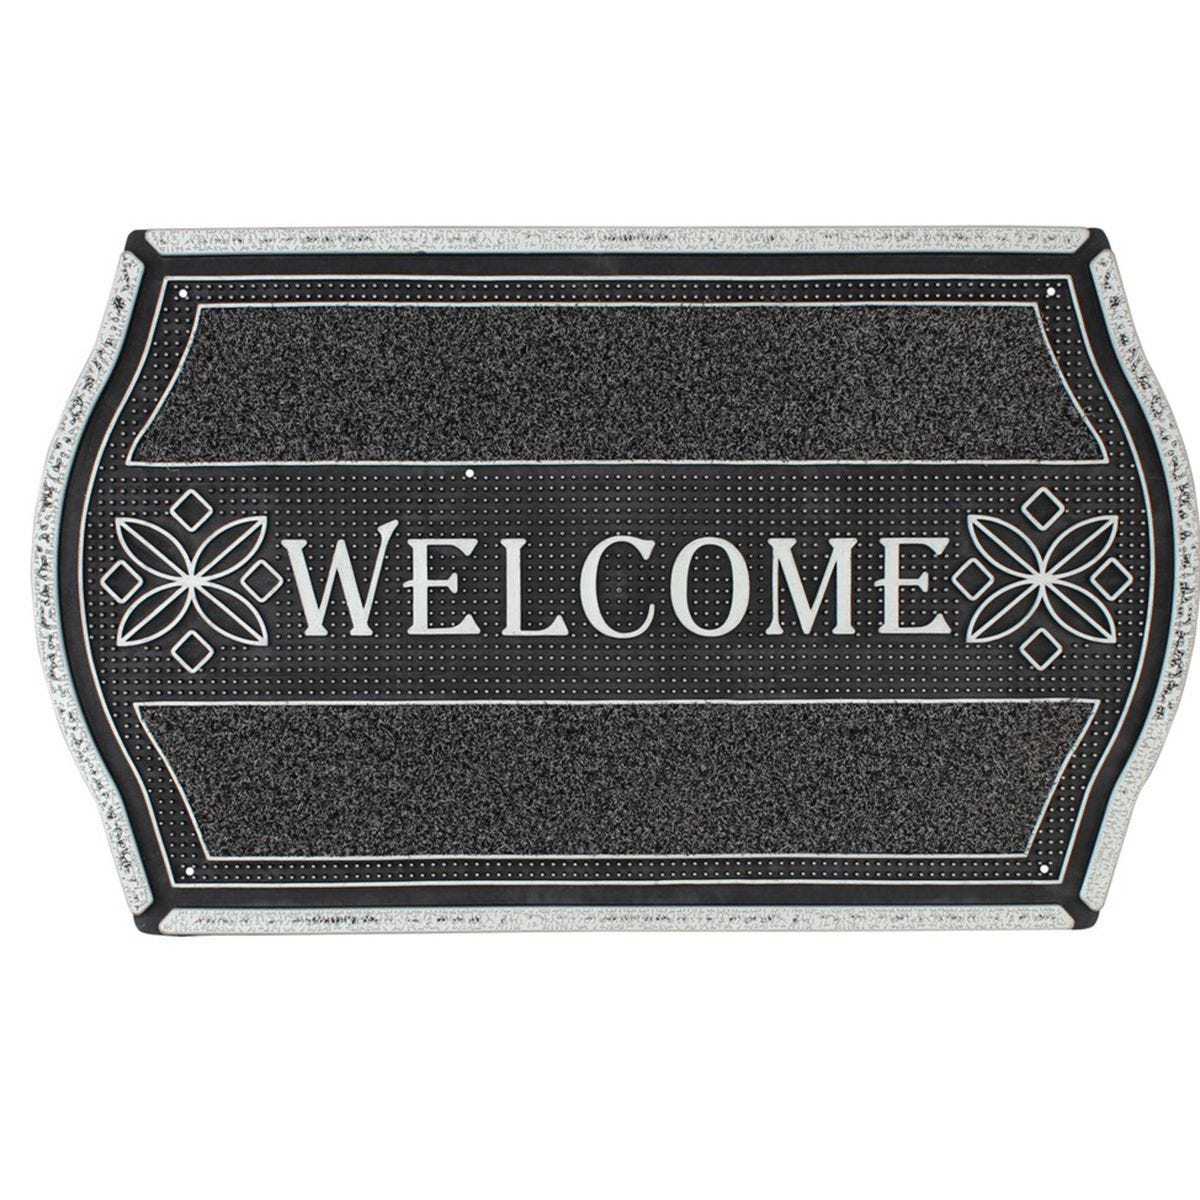 JVL 45x75cm Floral Look PVC Welcome Doormat - Silver/Black